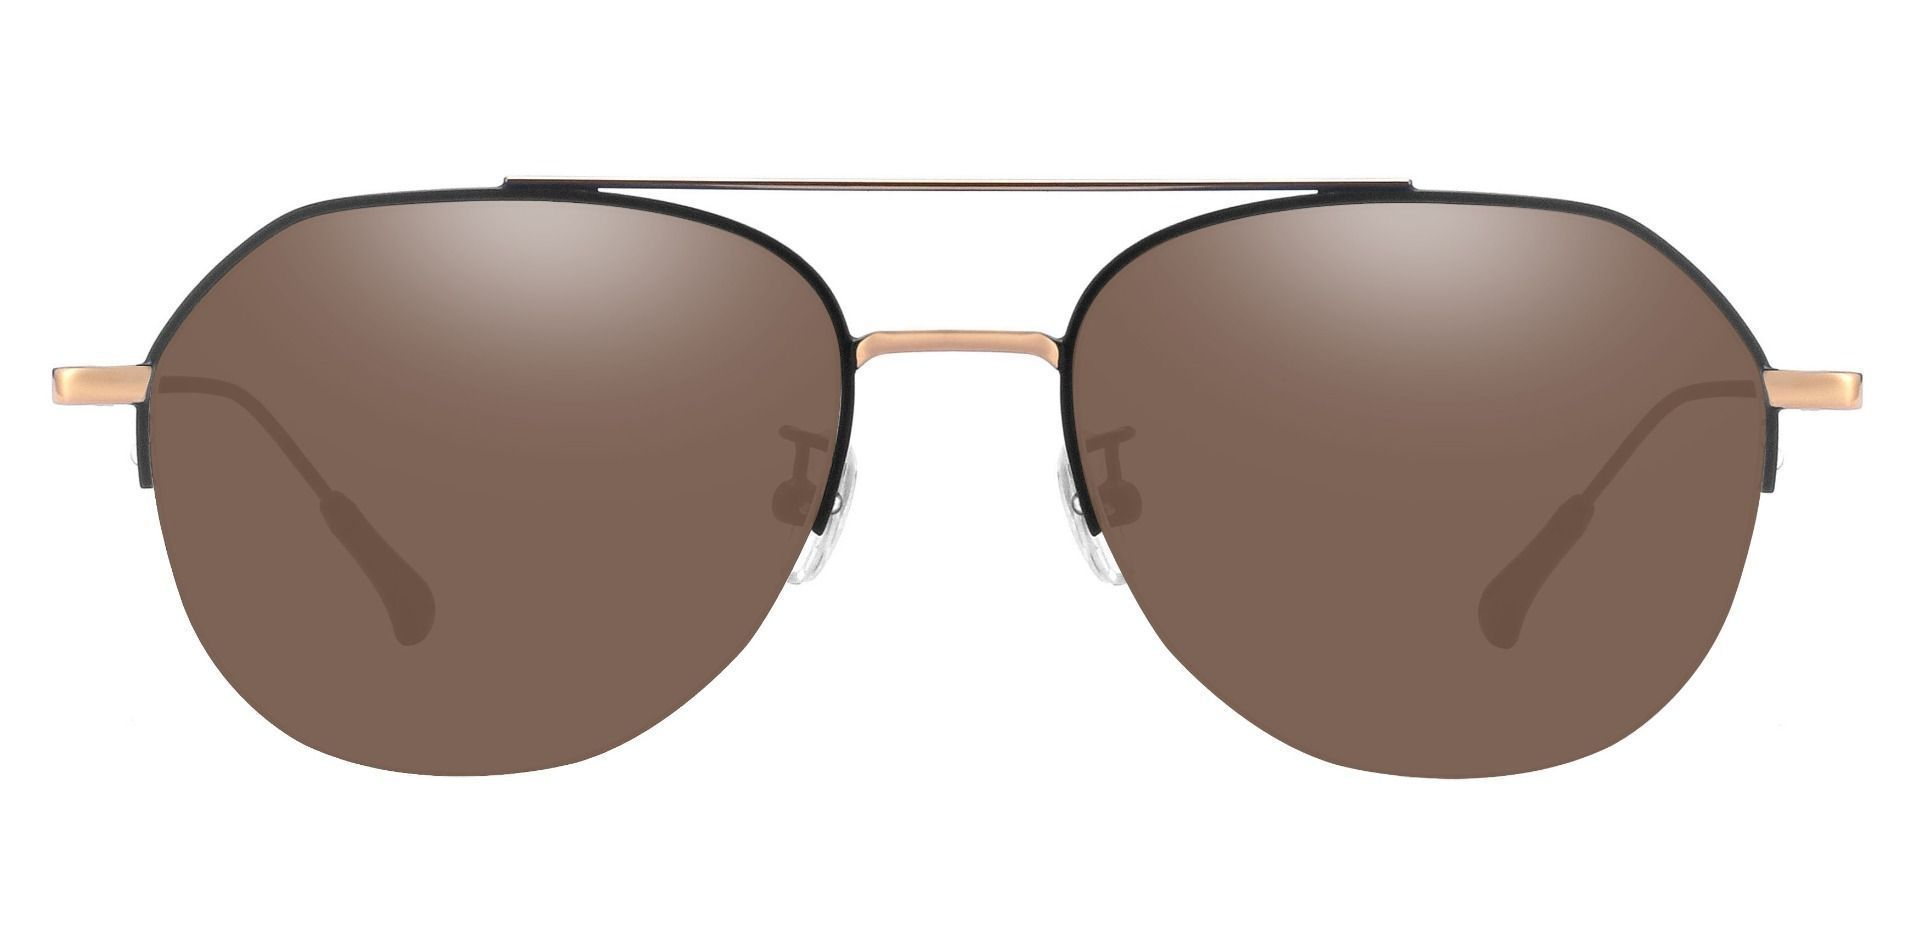 Porter Aviator Prescription Sunglasses -  Black Frame With Brown Lenses